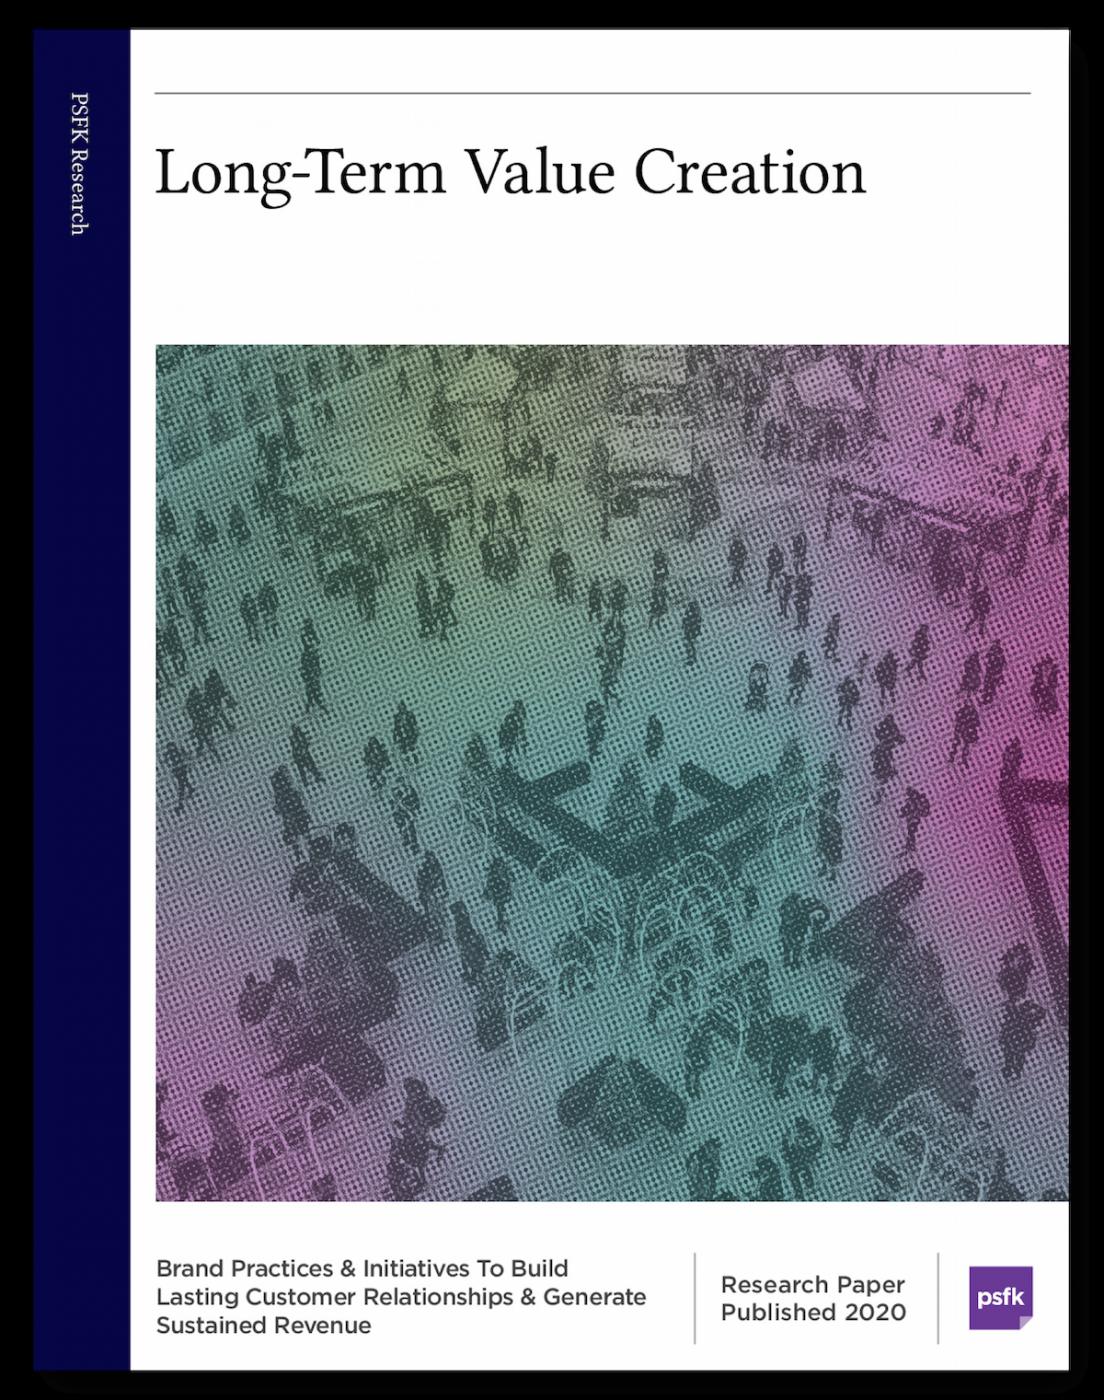 Long-Term Value Creation